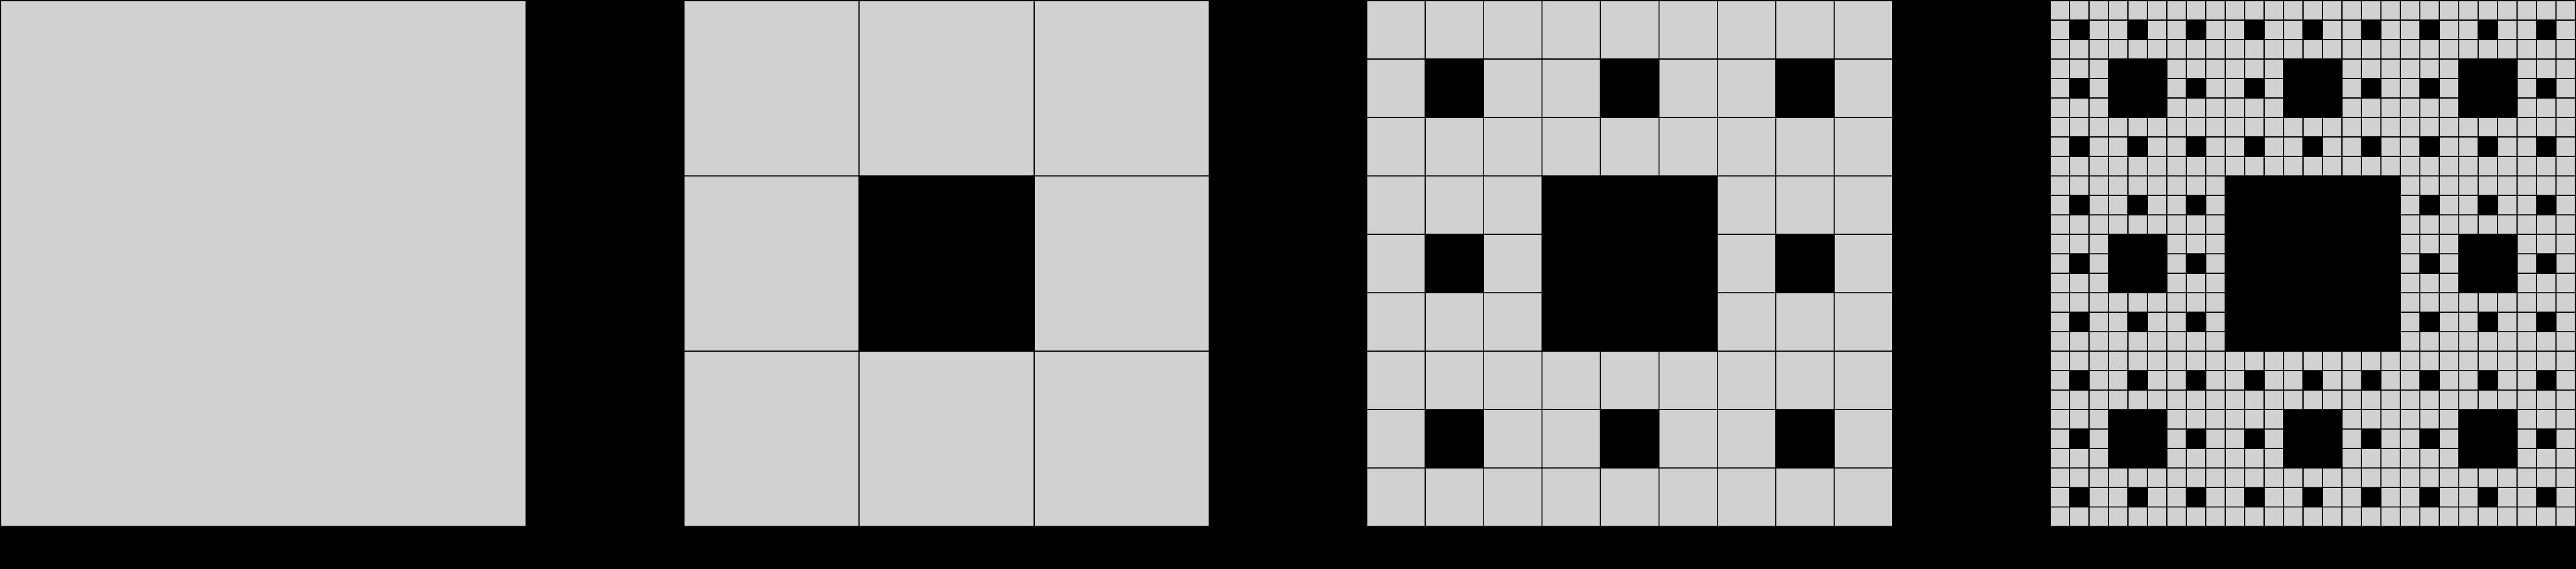 Rosetta - Tutorials